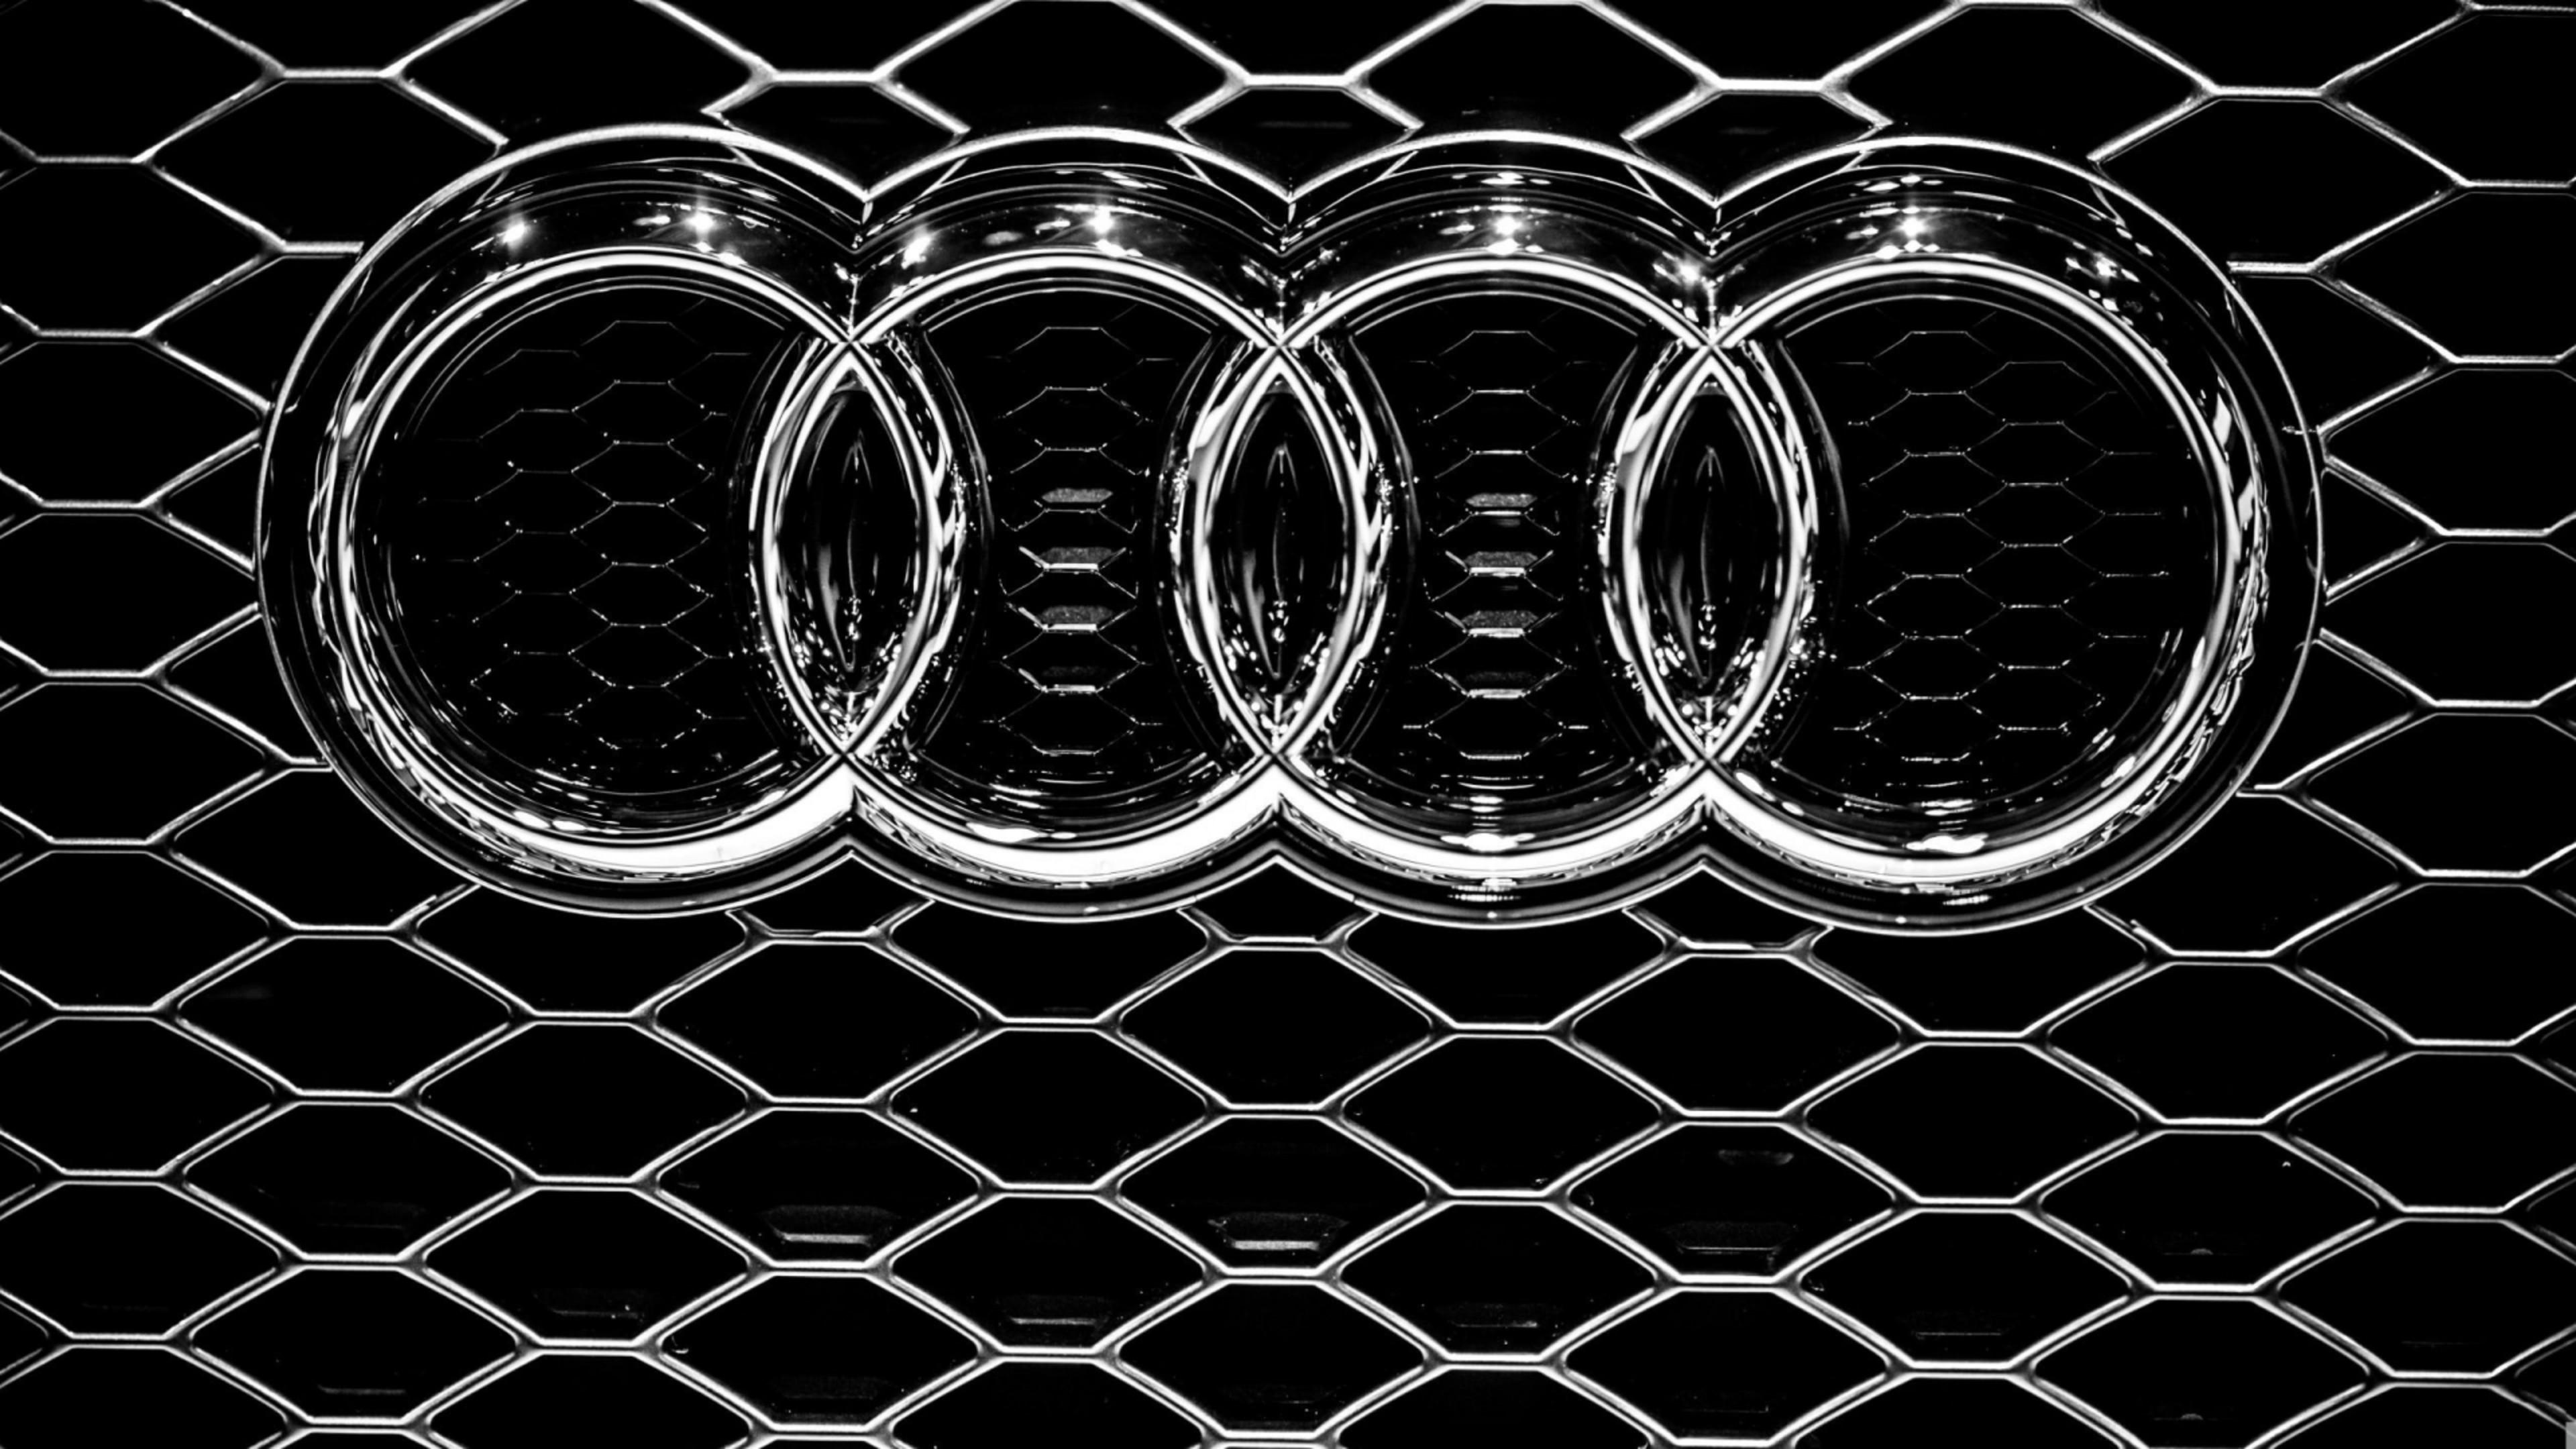 Audi Logo Wallpaper HD Wallpapers Backgrounds Images Art Photos 3840x2160